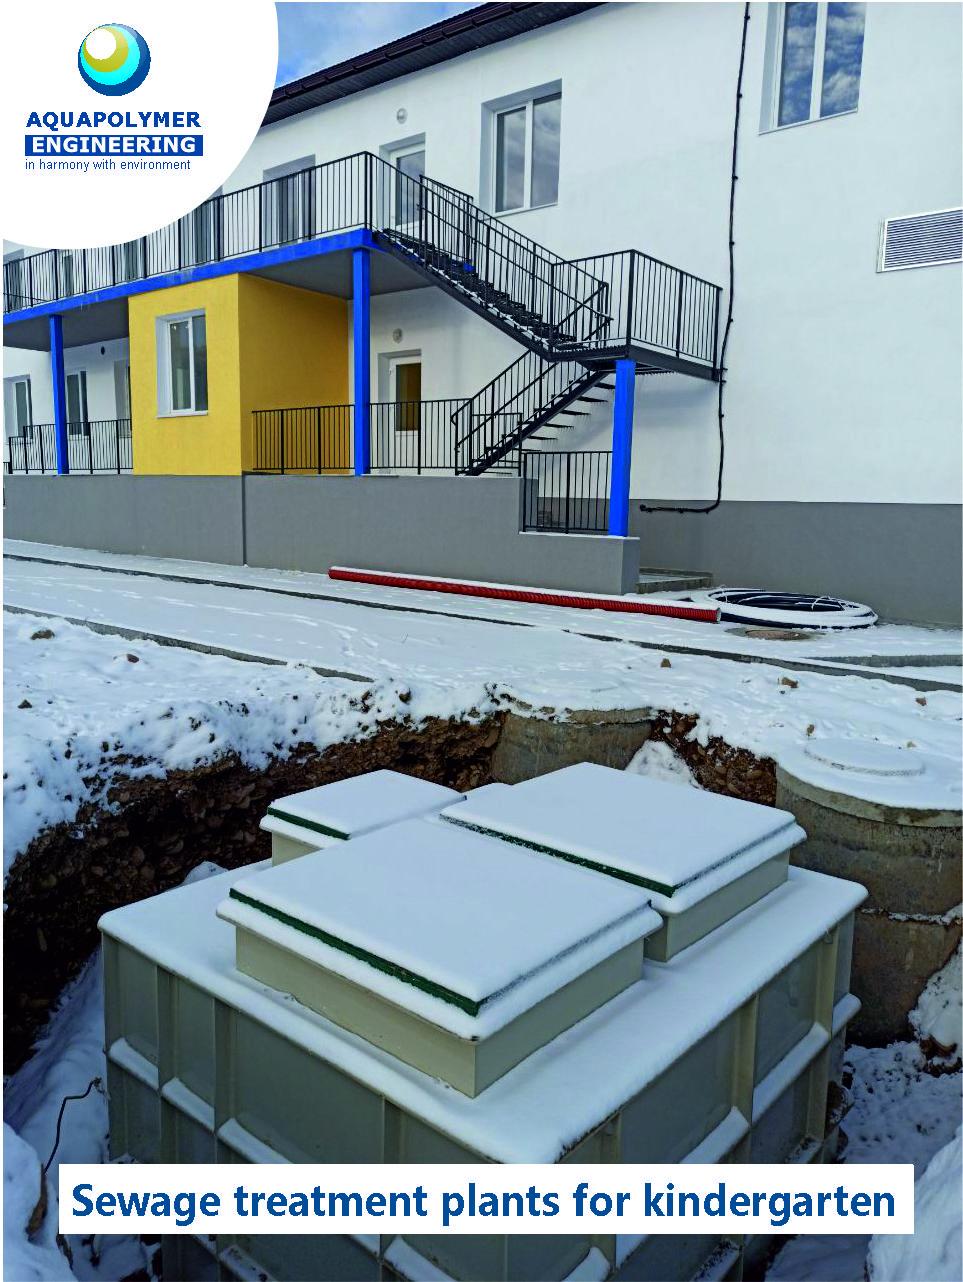 MakBoxPro 8 treatment plant for kindergarten